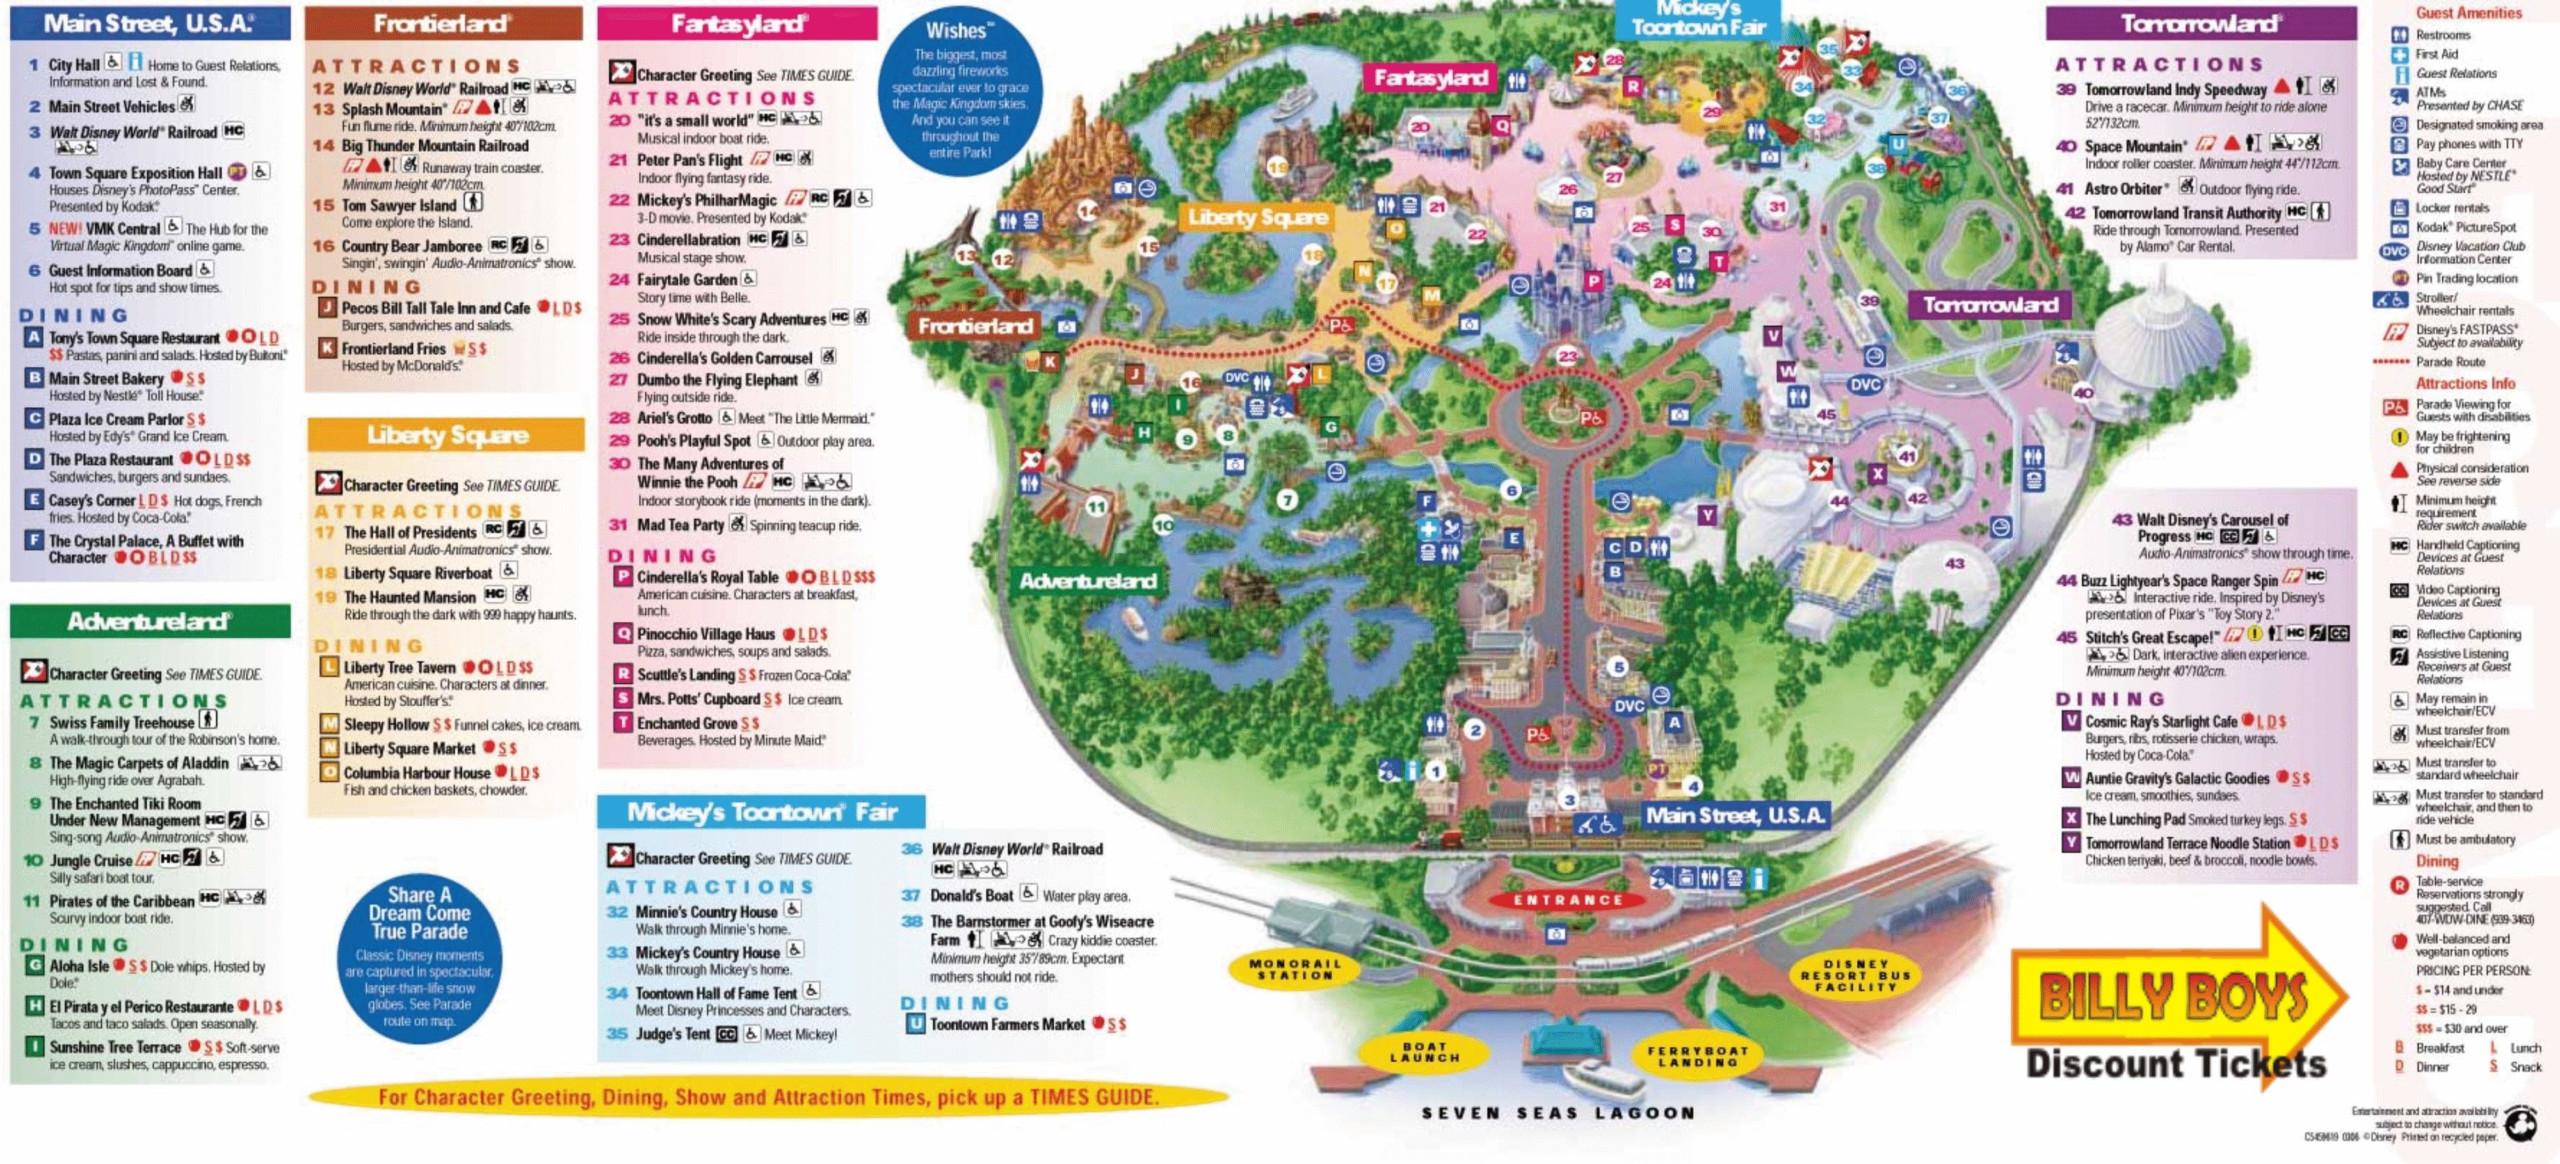 Walt Disney World Map Pdf 1